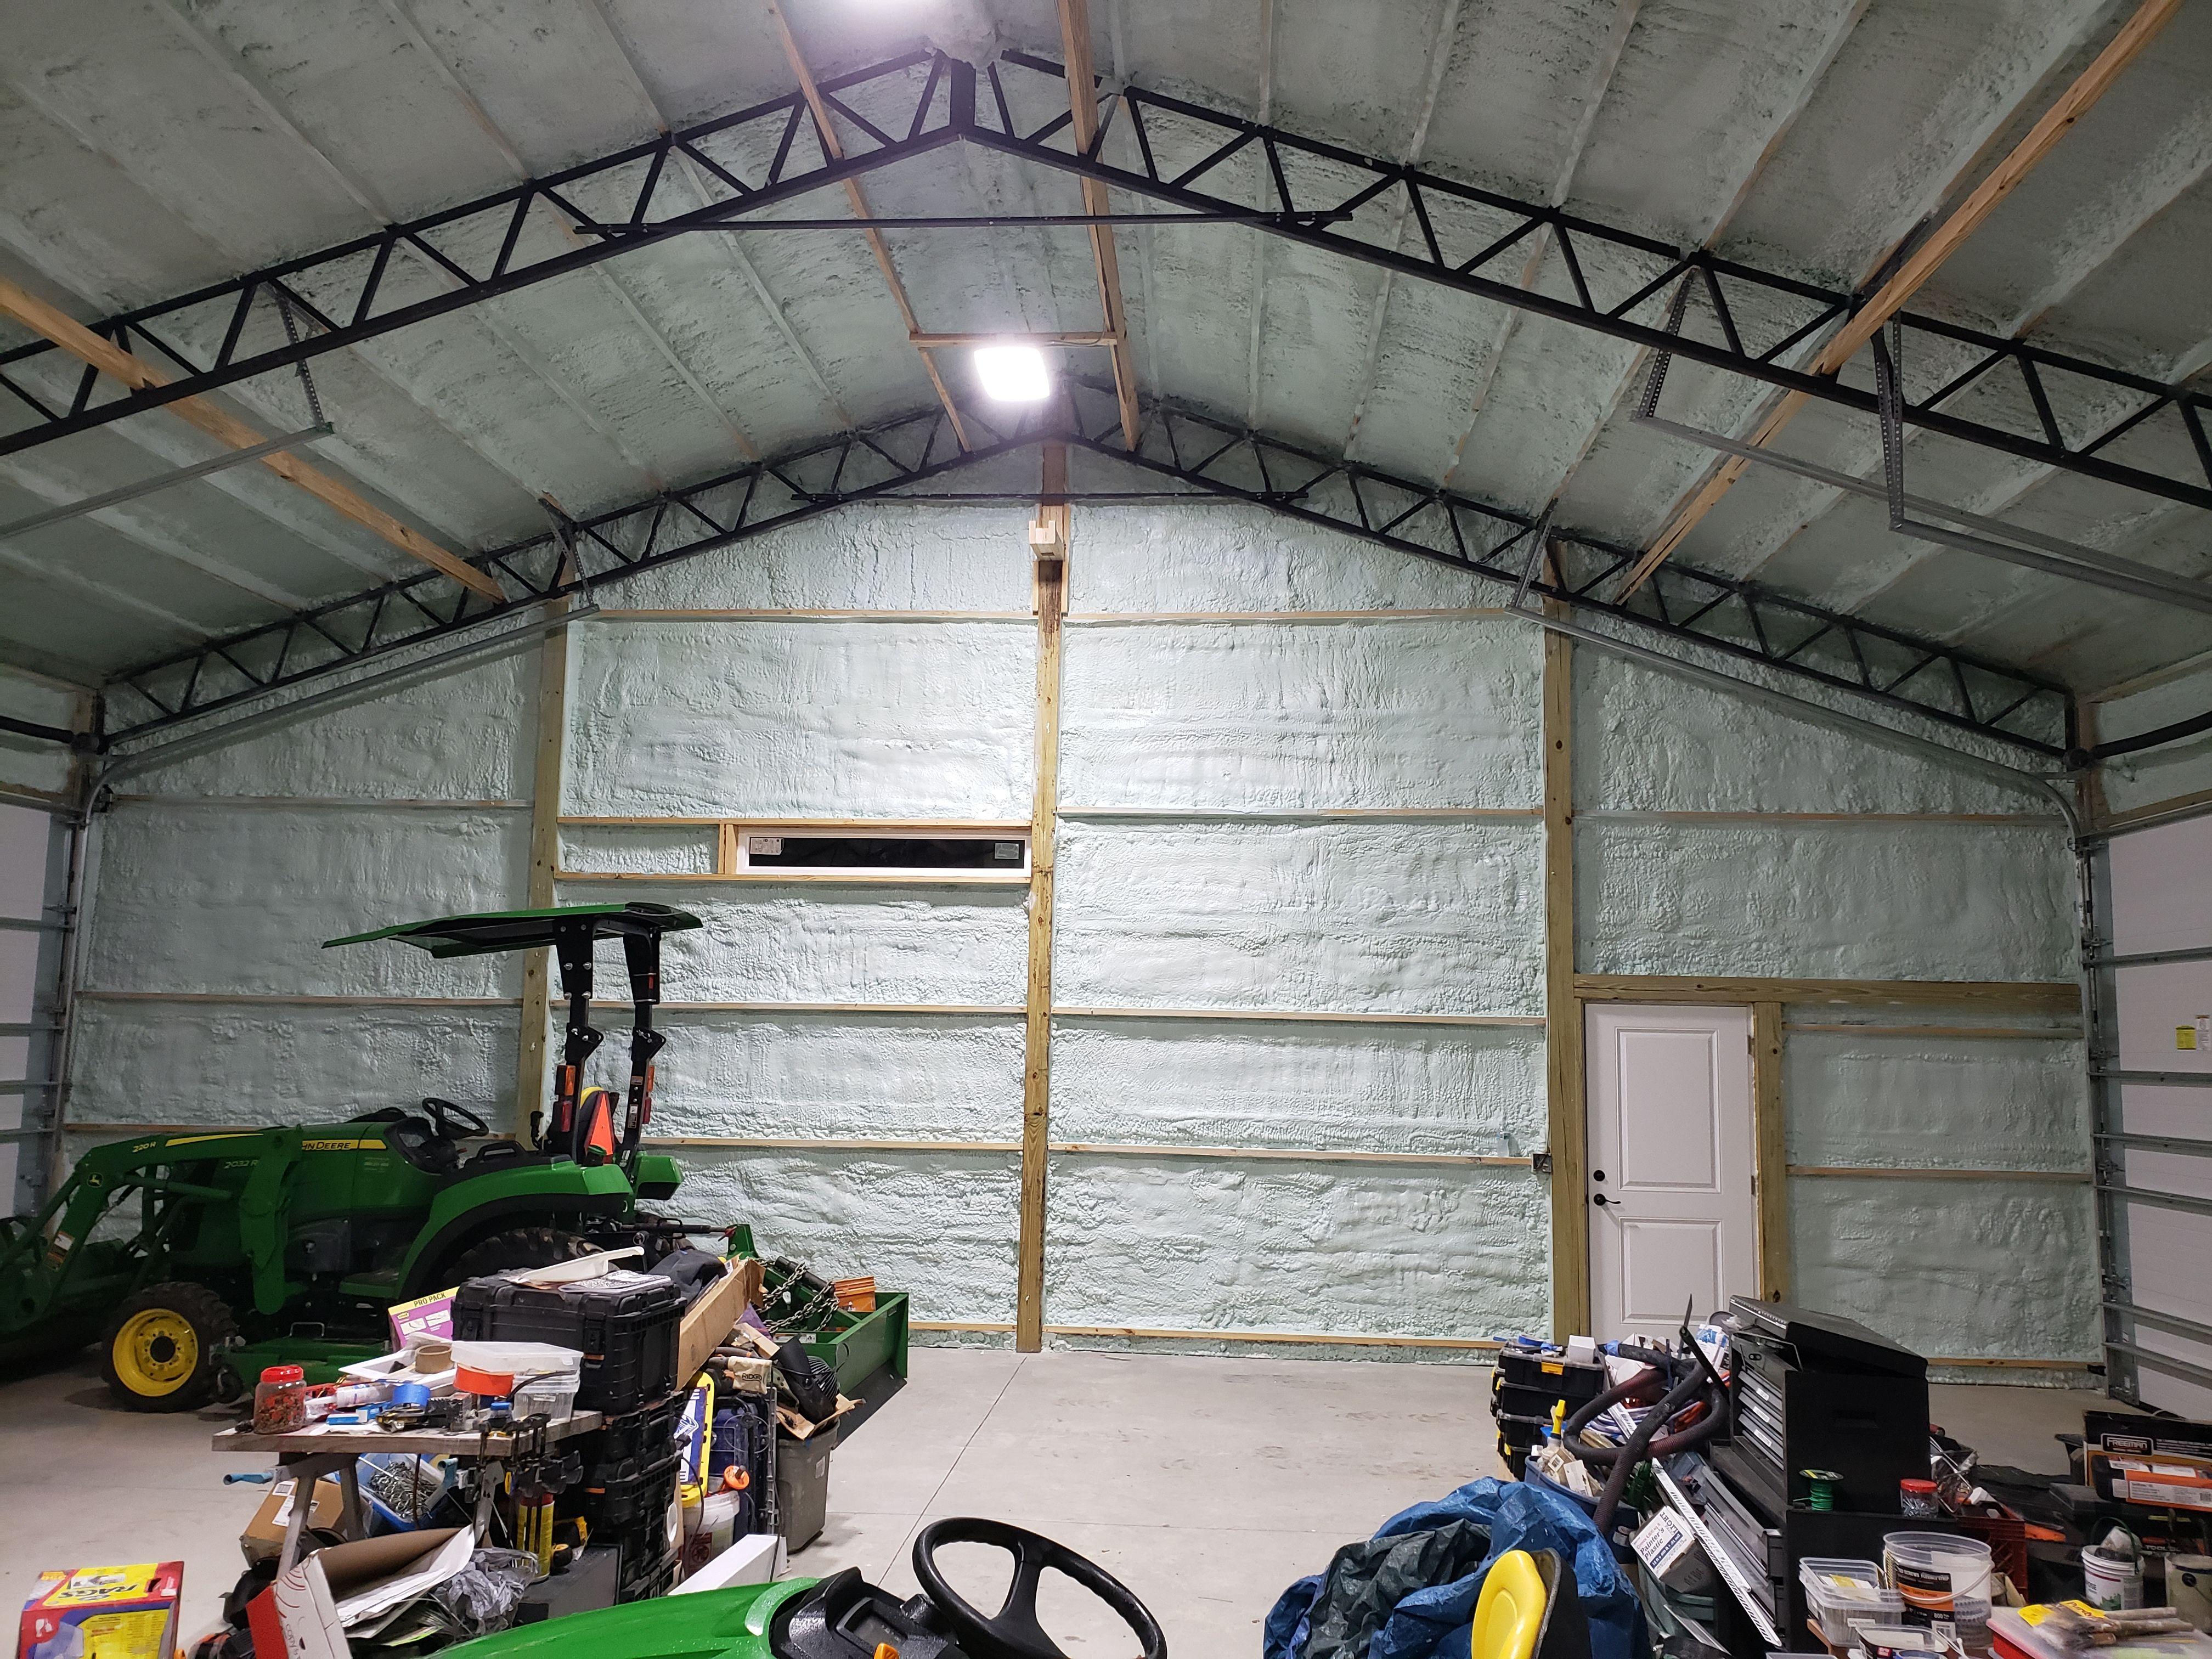 spray foam insulation in 2020 Spray foam insulation